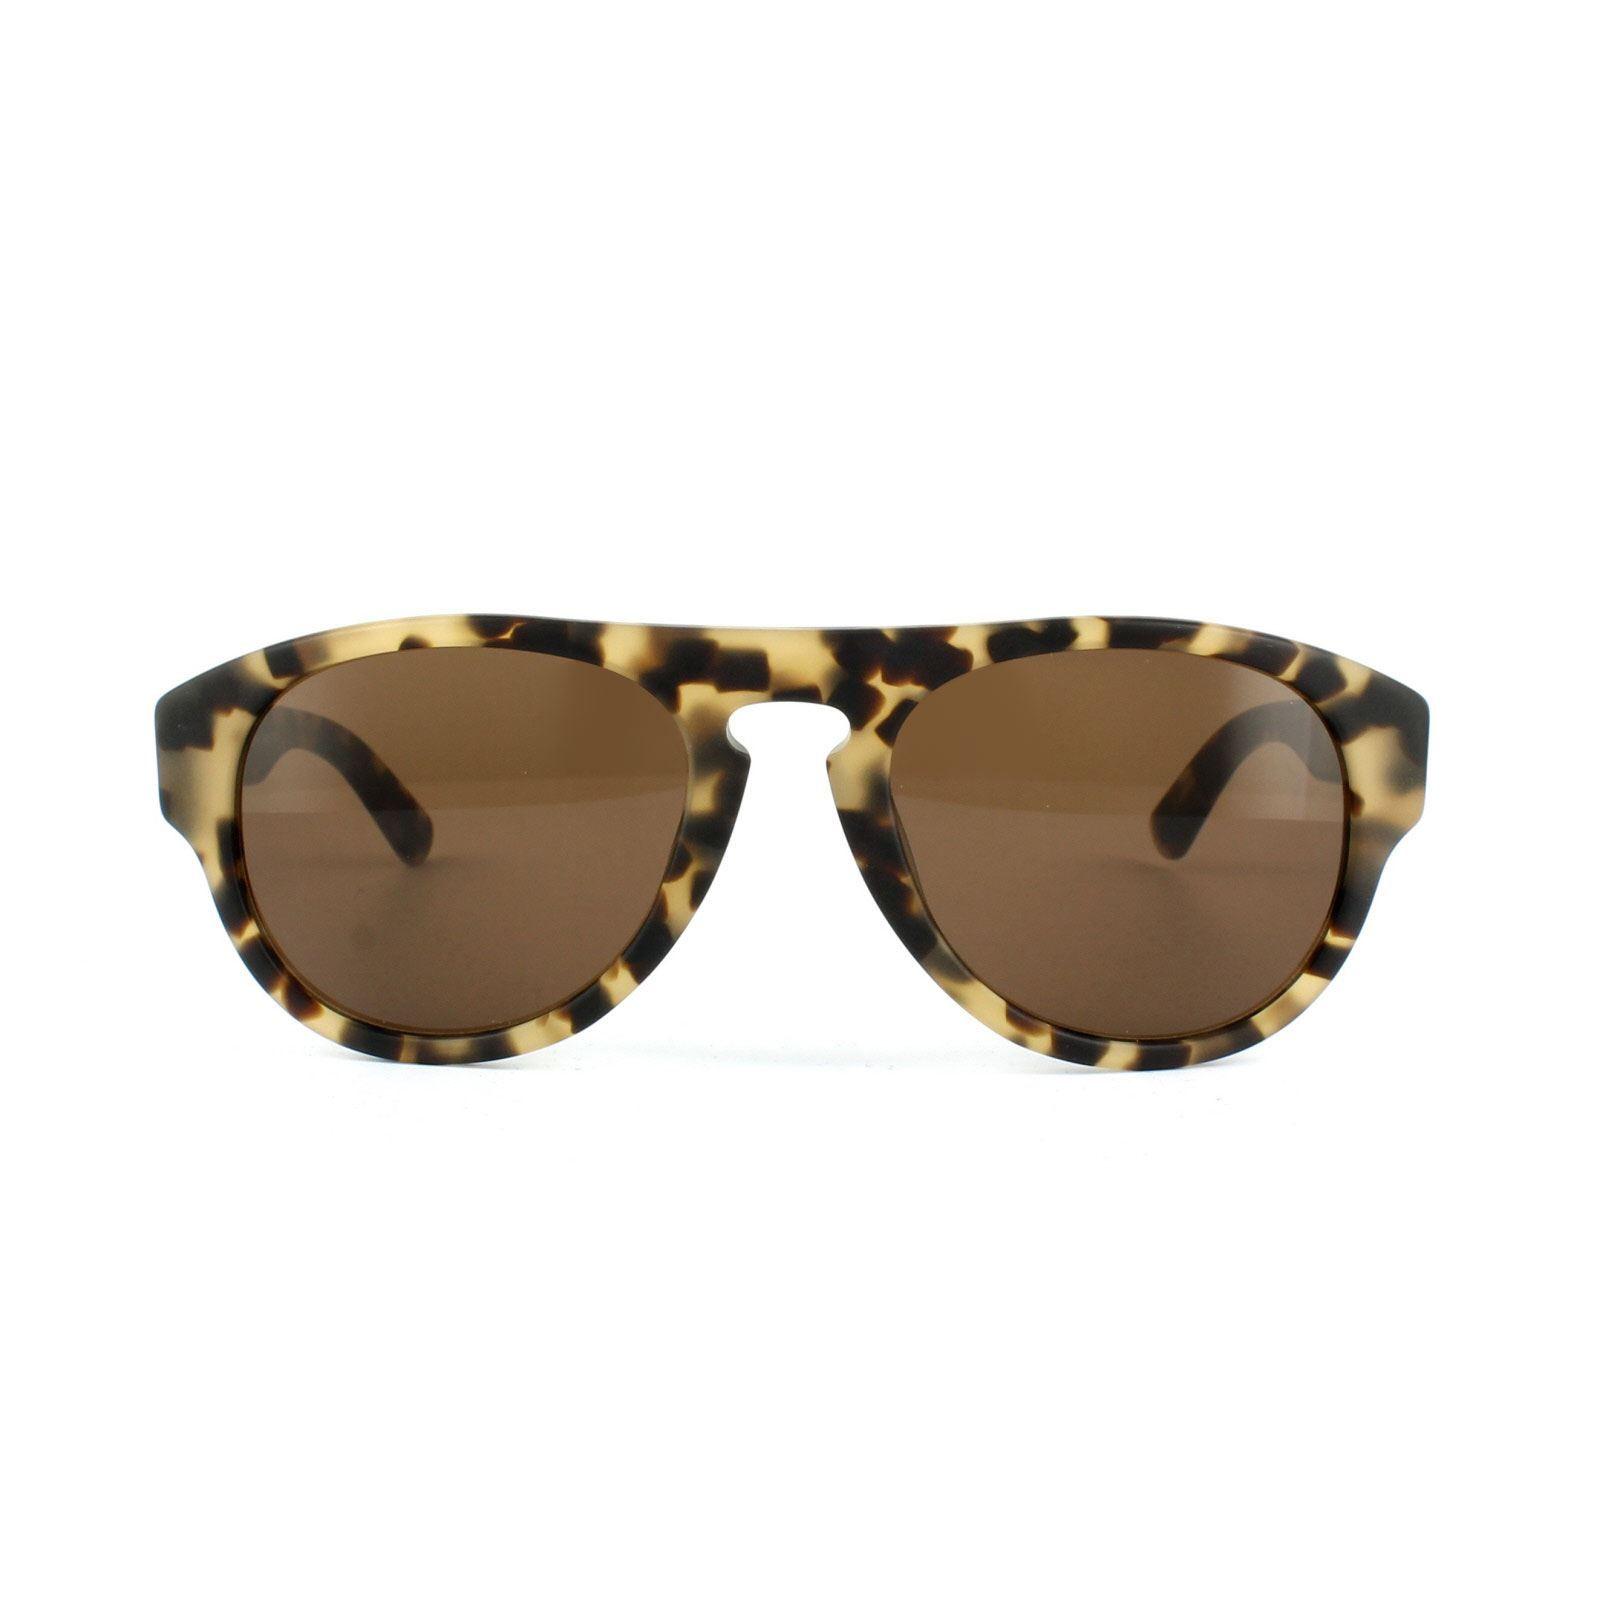 Calvin Klein Sunglasses CK7962 220 Khaki Tortoise Brown